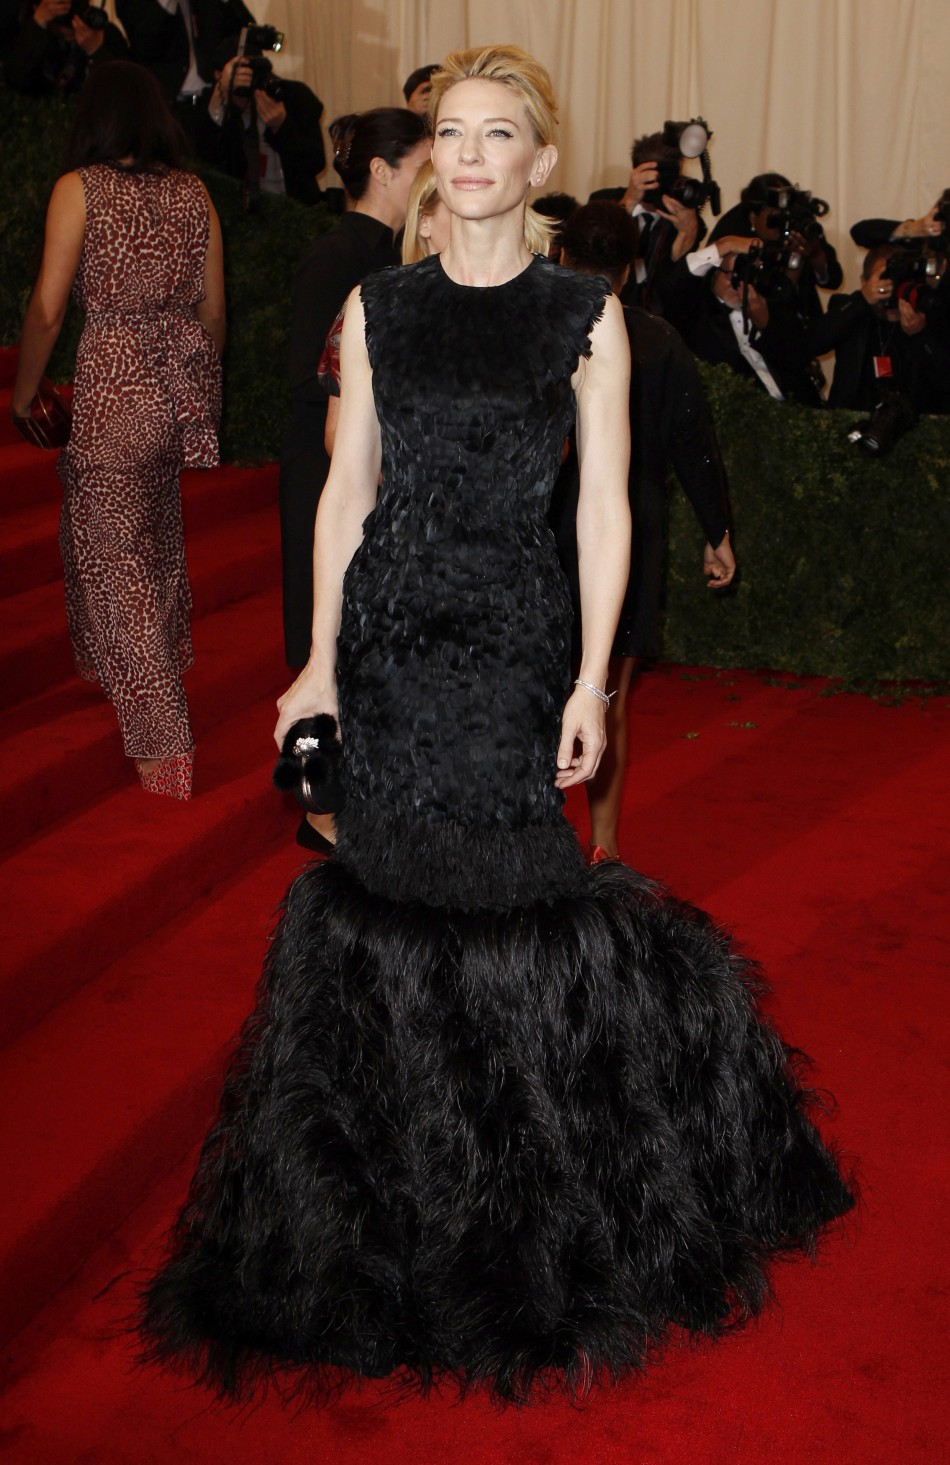 Cate Blanchett at the MET Gala Costume Benefit